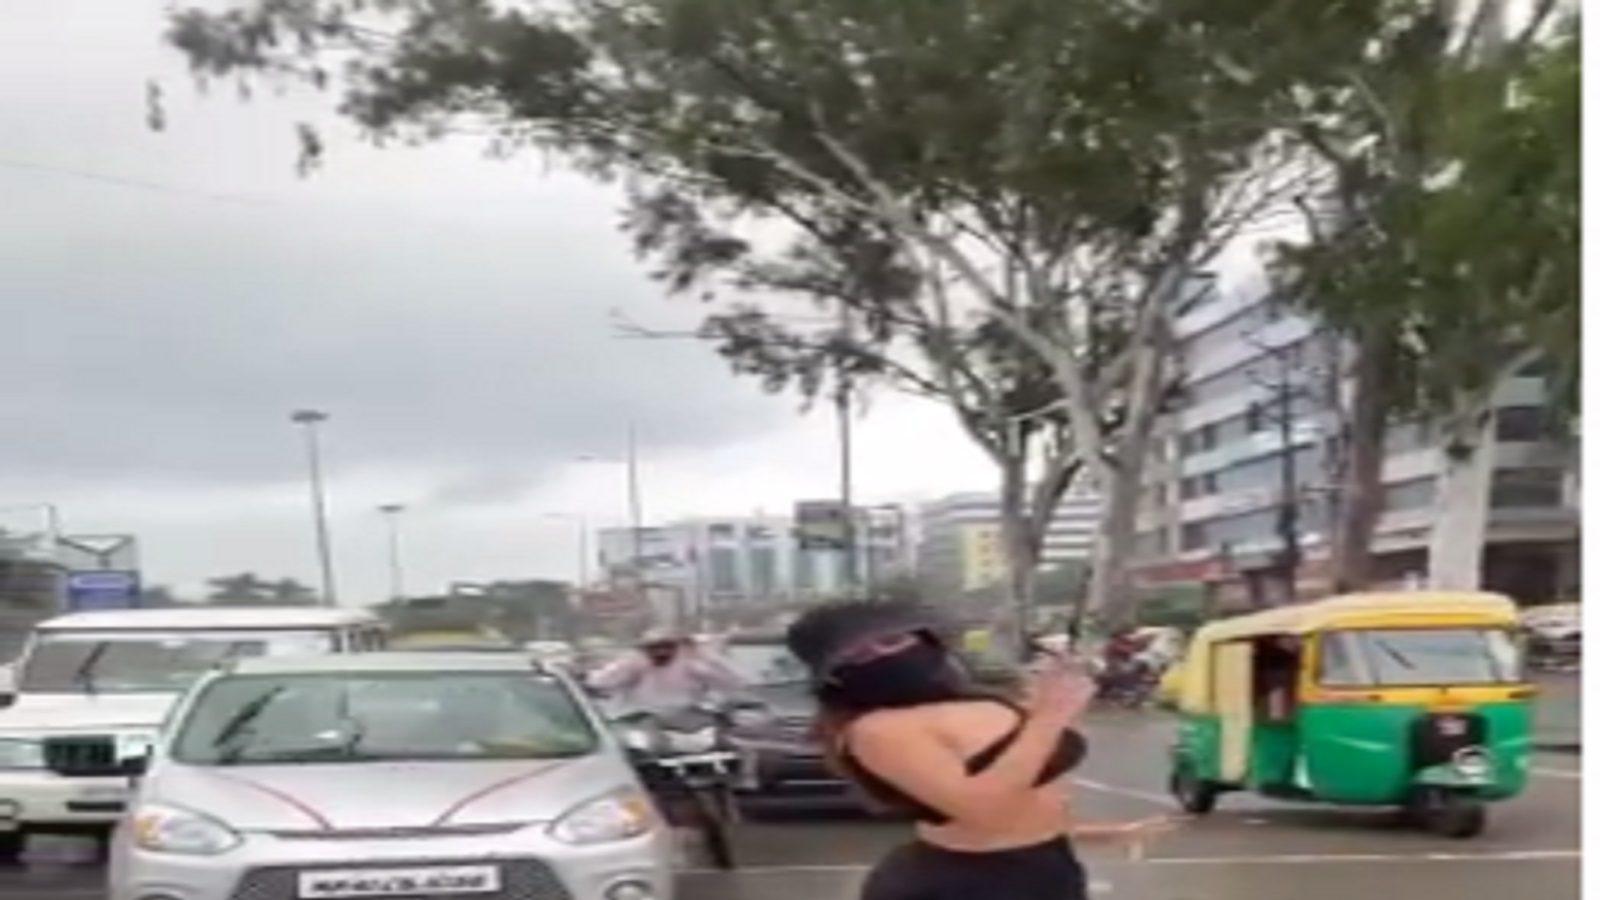 INDORE : रेड लाइट पर जब अचानक युवती करने लगी डांस, ट्रैफिक पुलिस बोली- ये तो हद हो गयी…